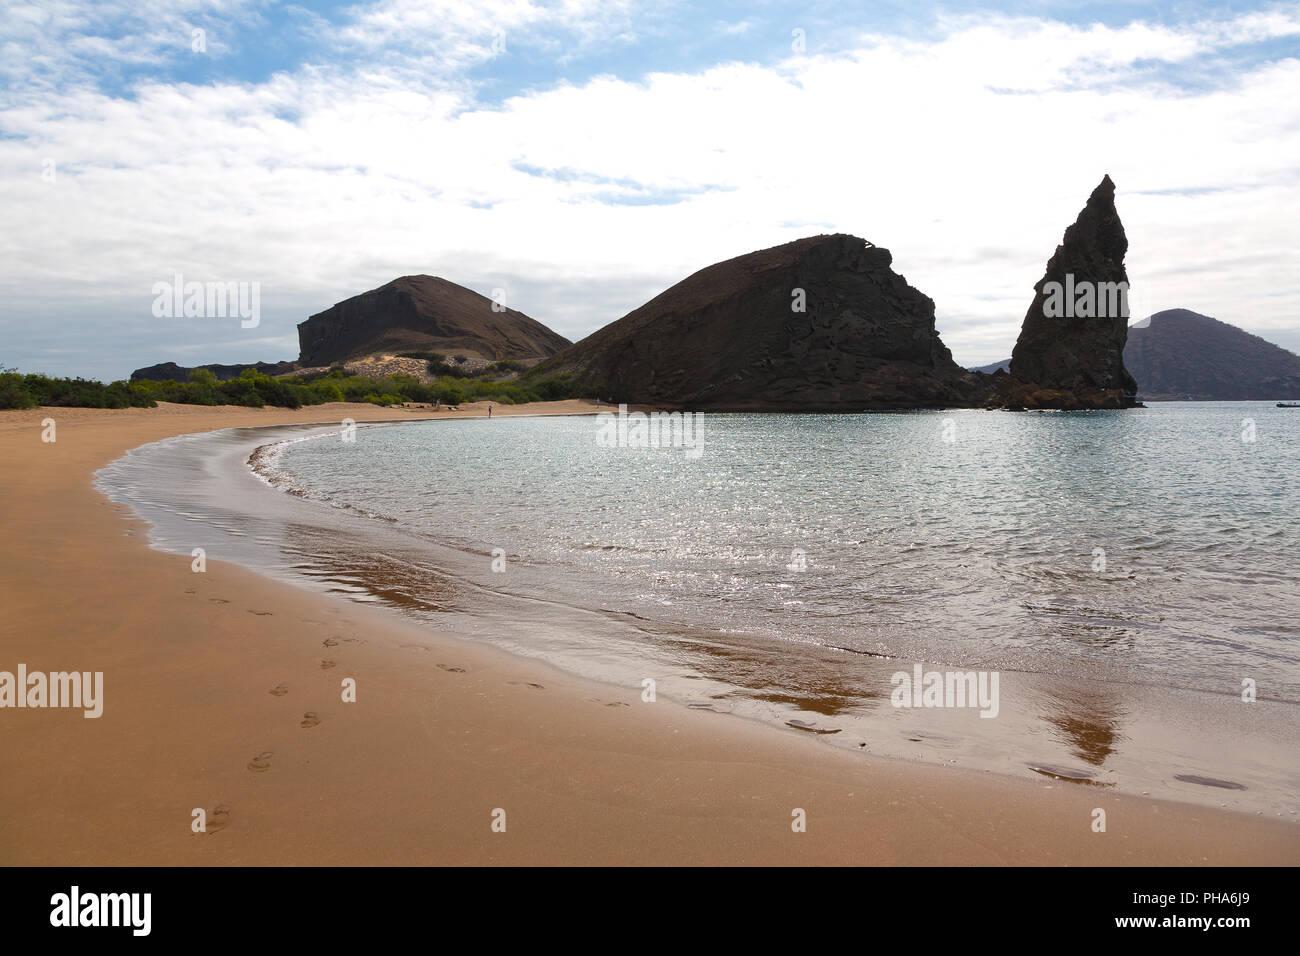 BARTOLOME ISLAND COAST WITH PINNACLE ROCK, GALAPAGOS - Stock Image